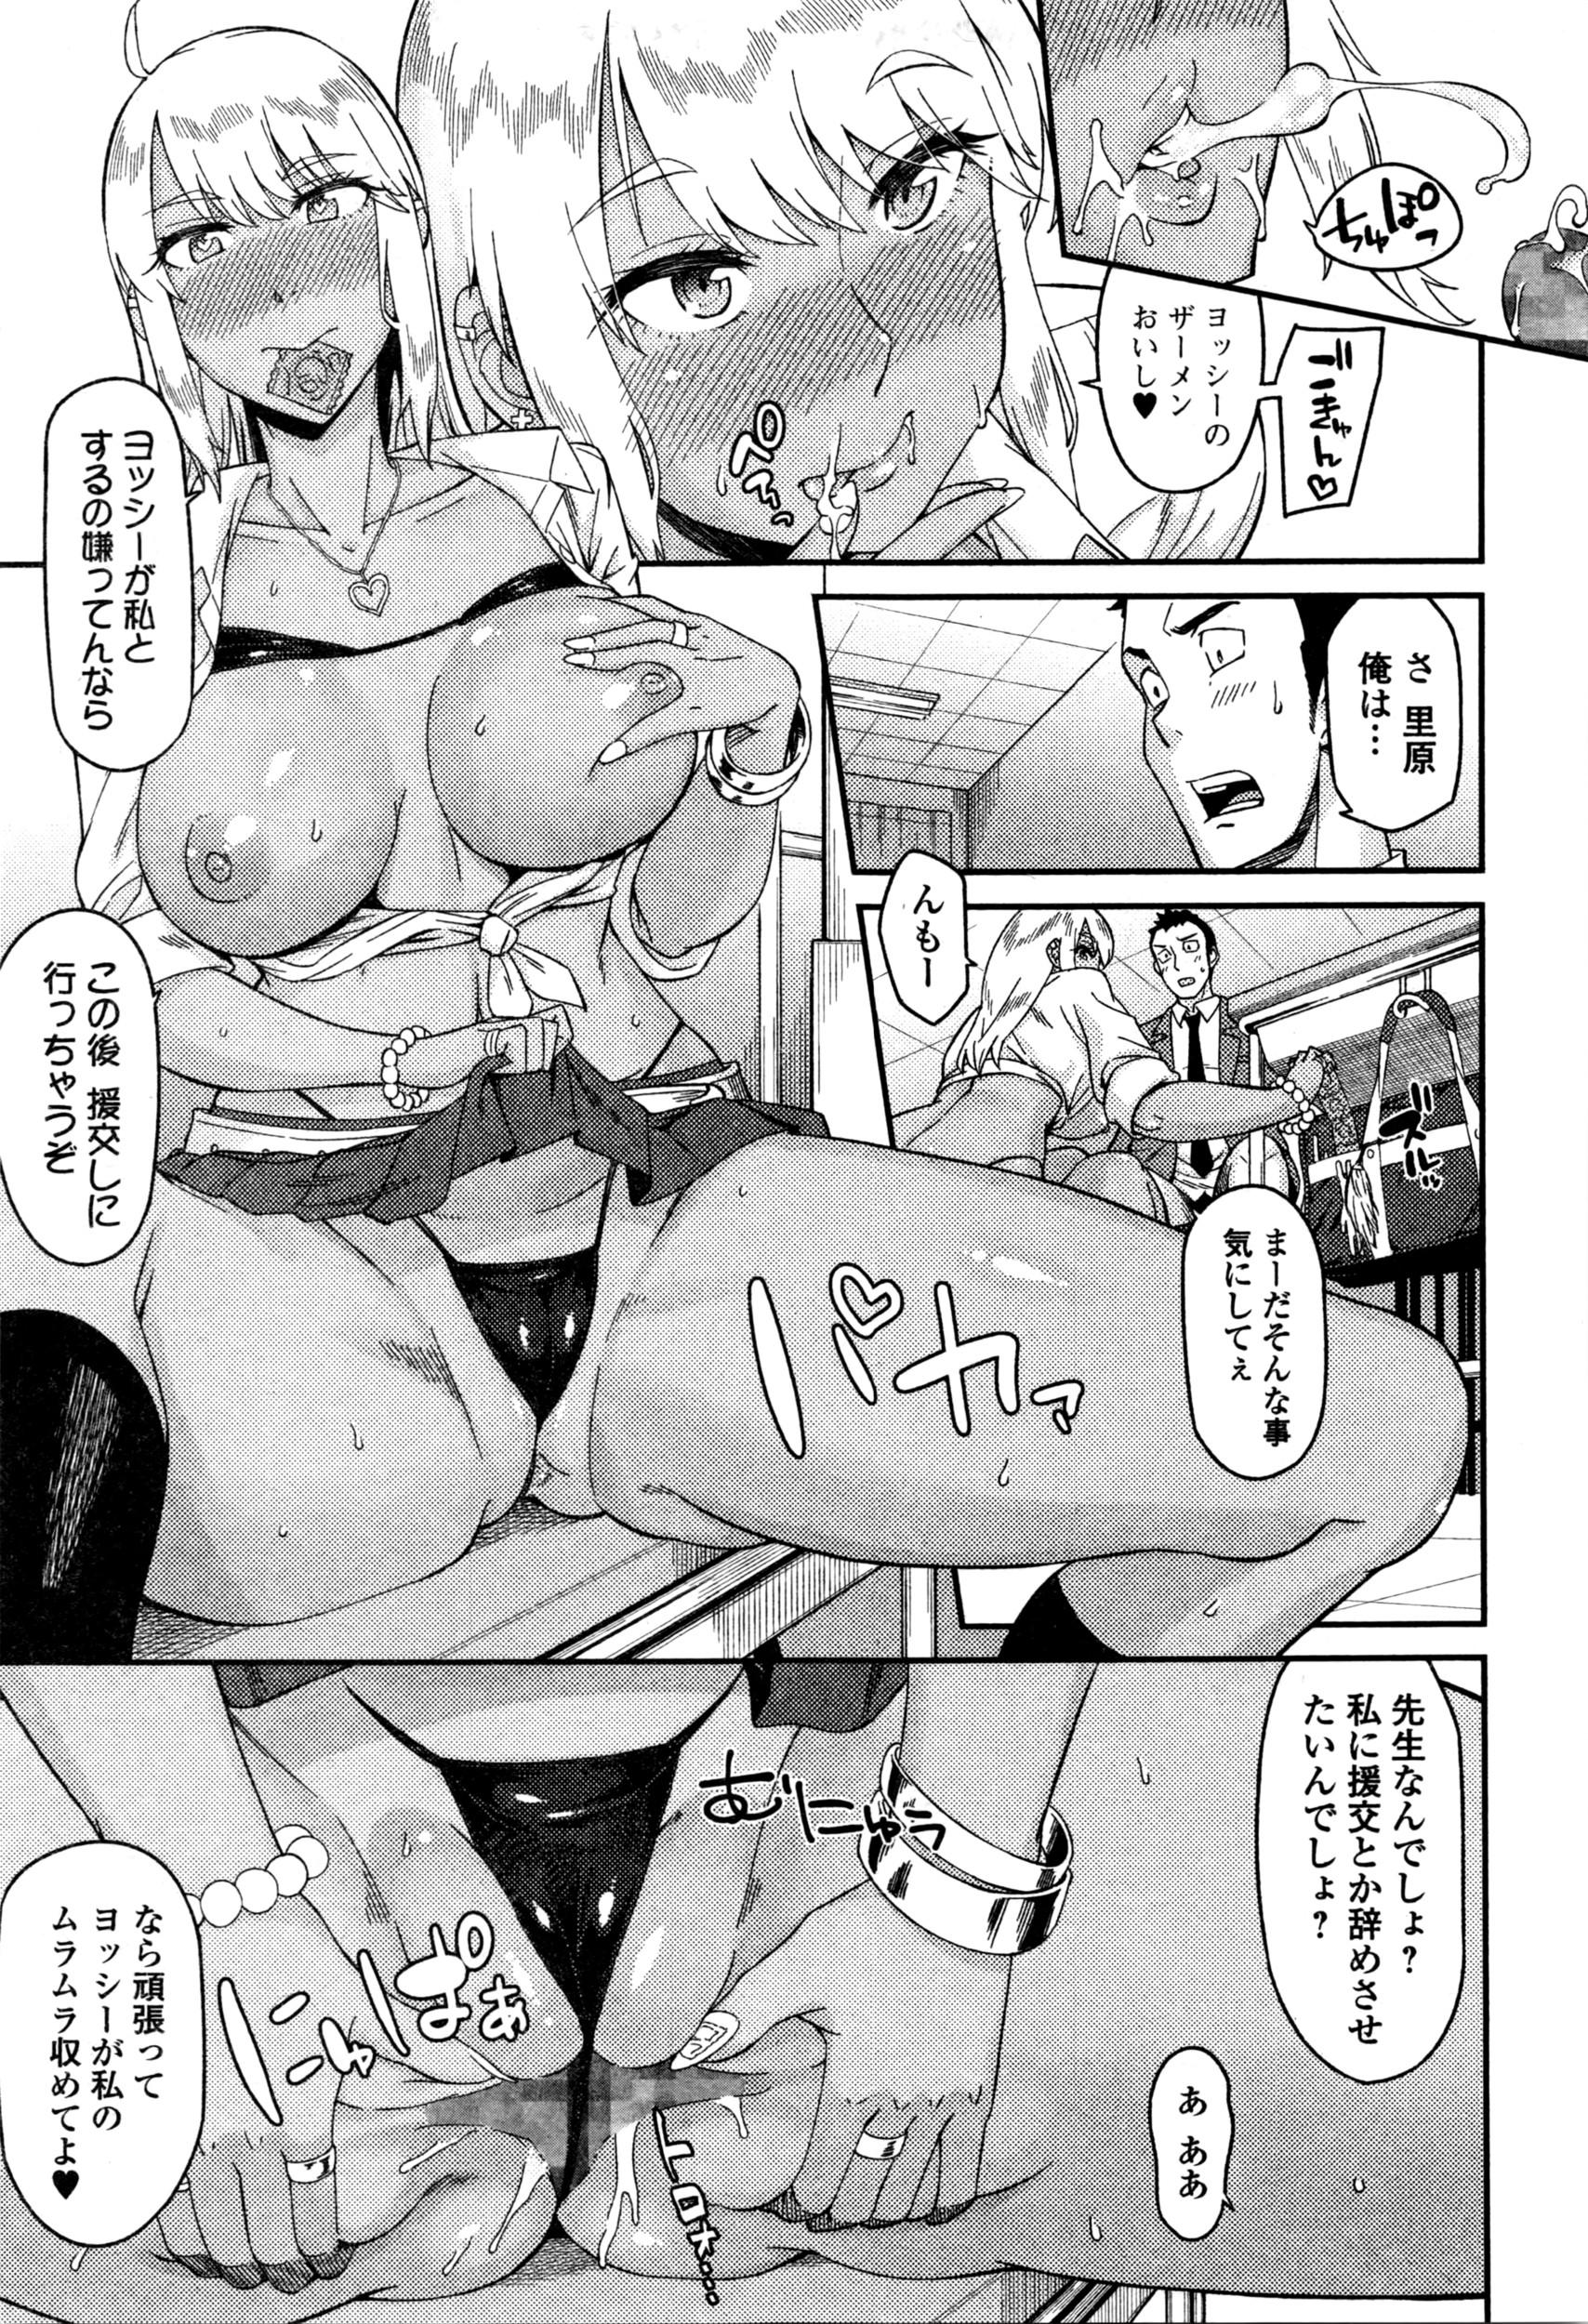 Comic JSCK Vol.3 2016-03 57